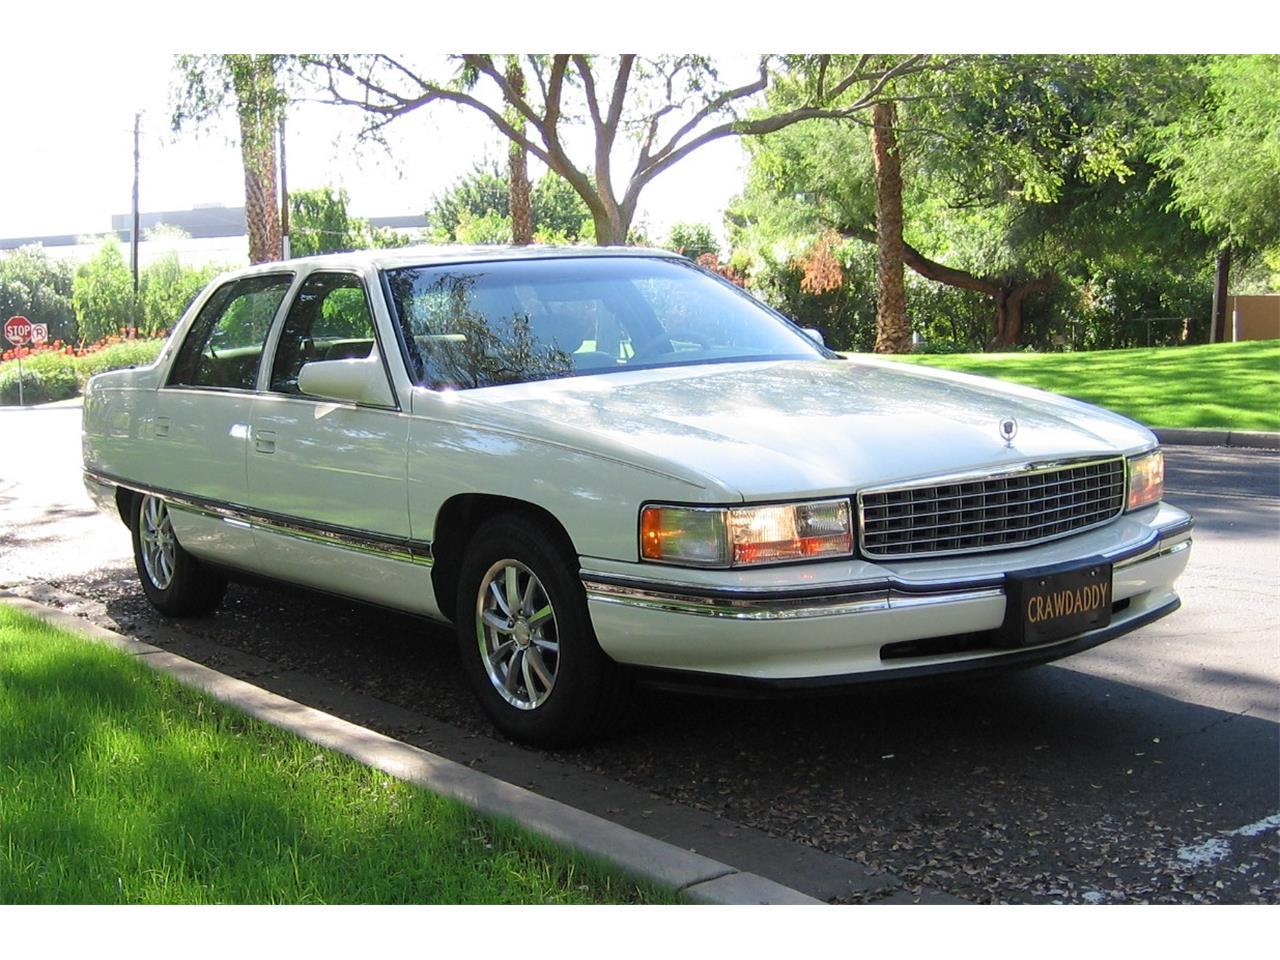 1995 Cadillac DeVille for Sale | ClassicCars.com | CC-1051576